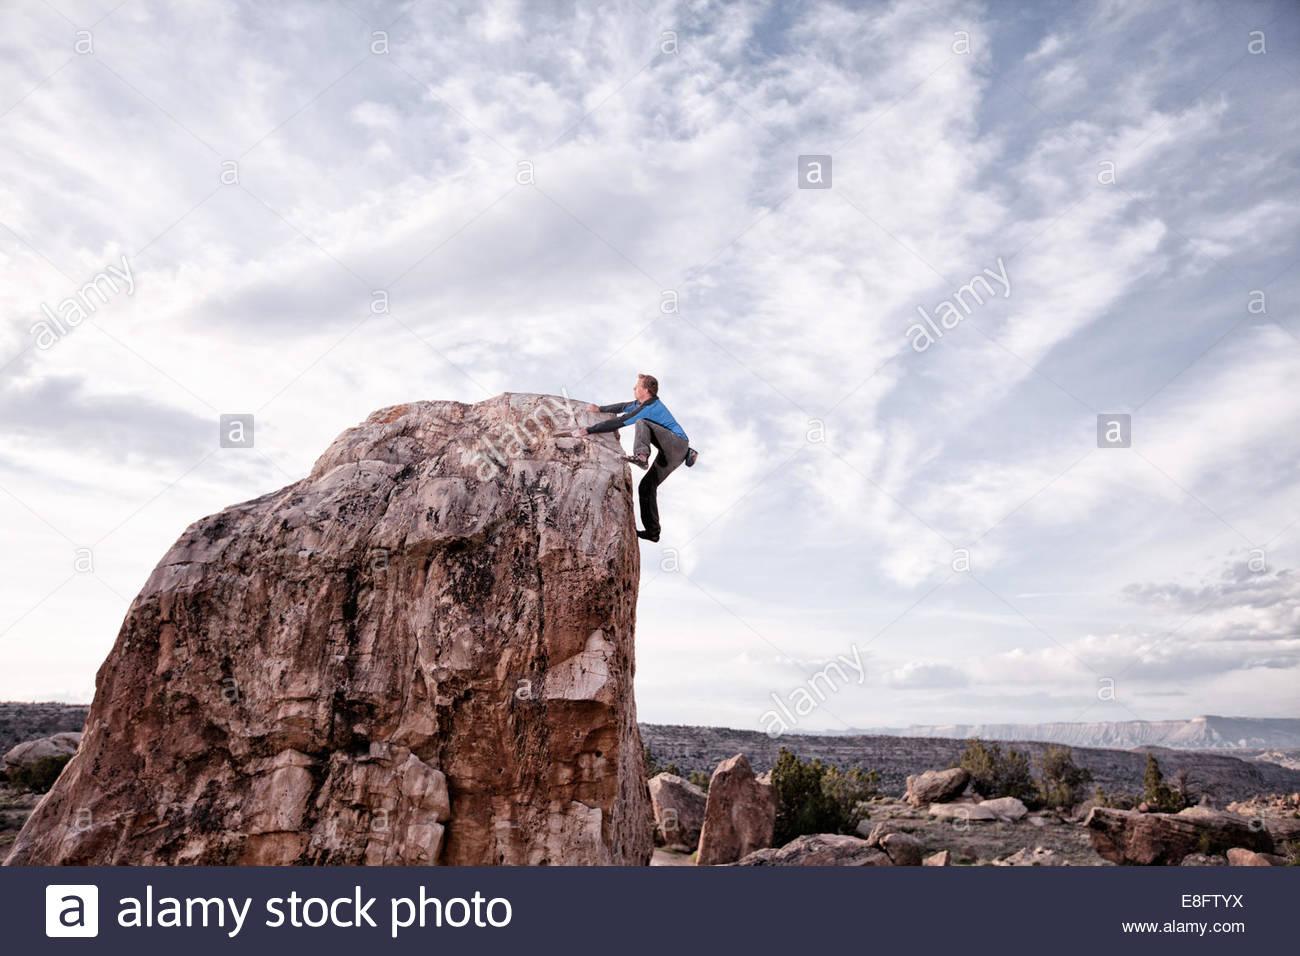 Man rock climbing, Colorado, America, USA - Stock Image